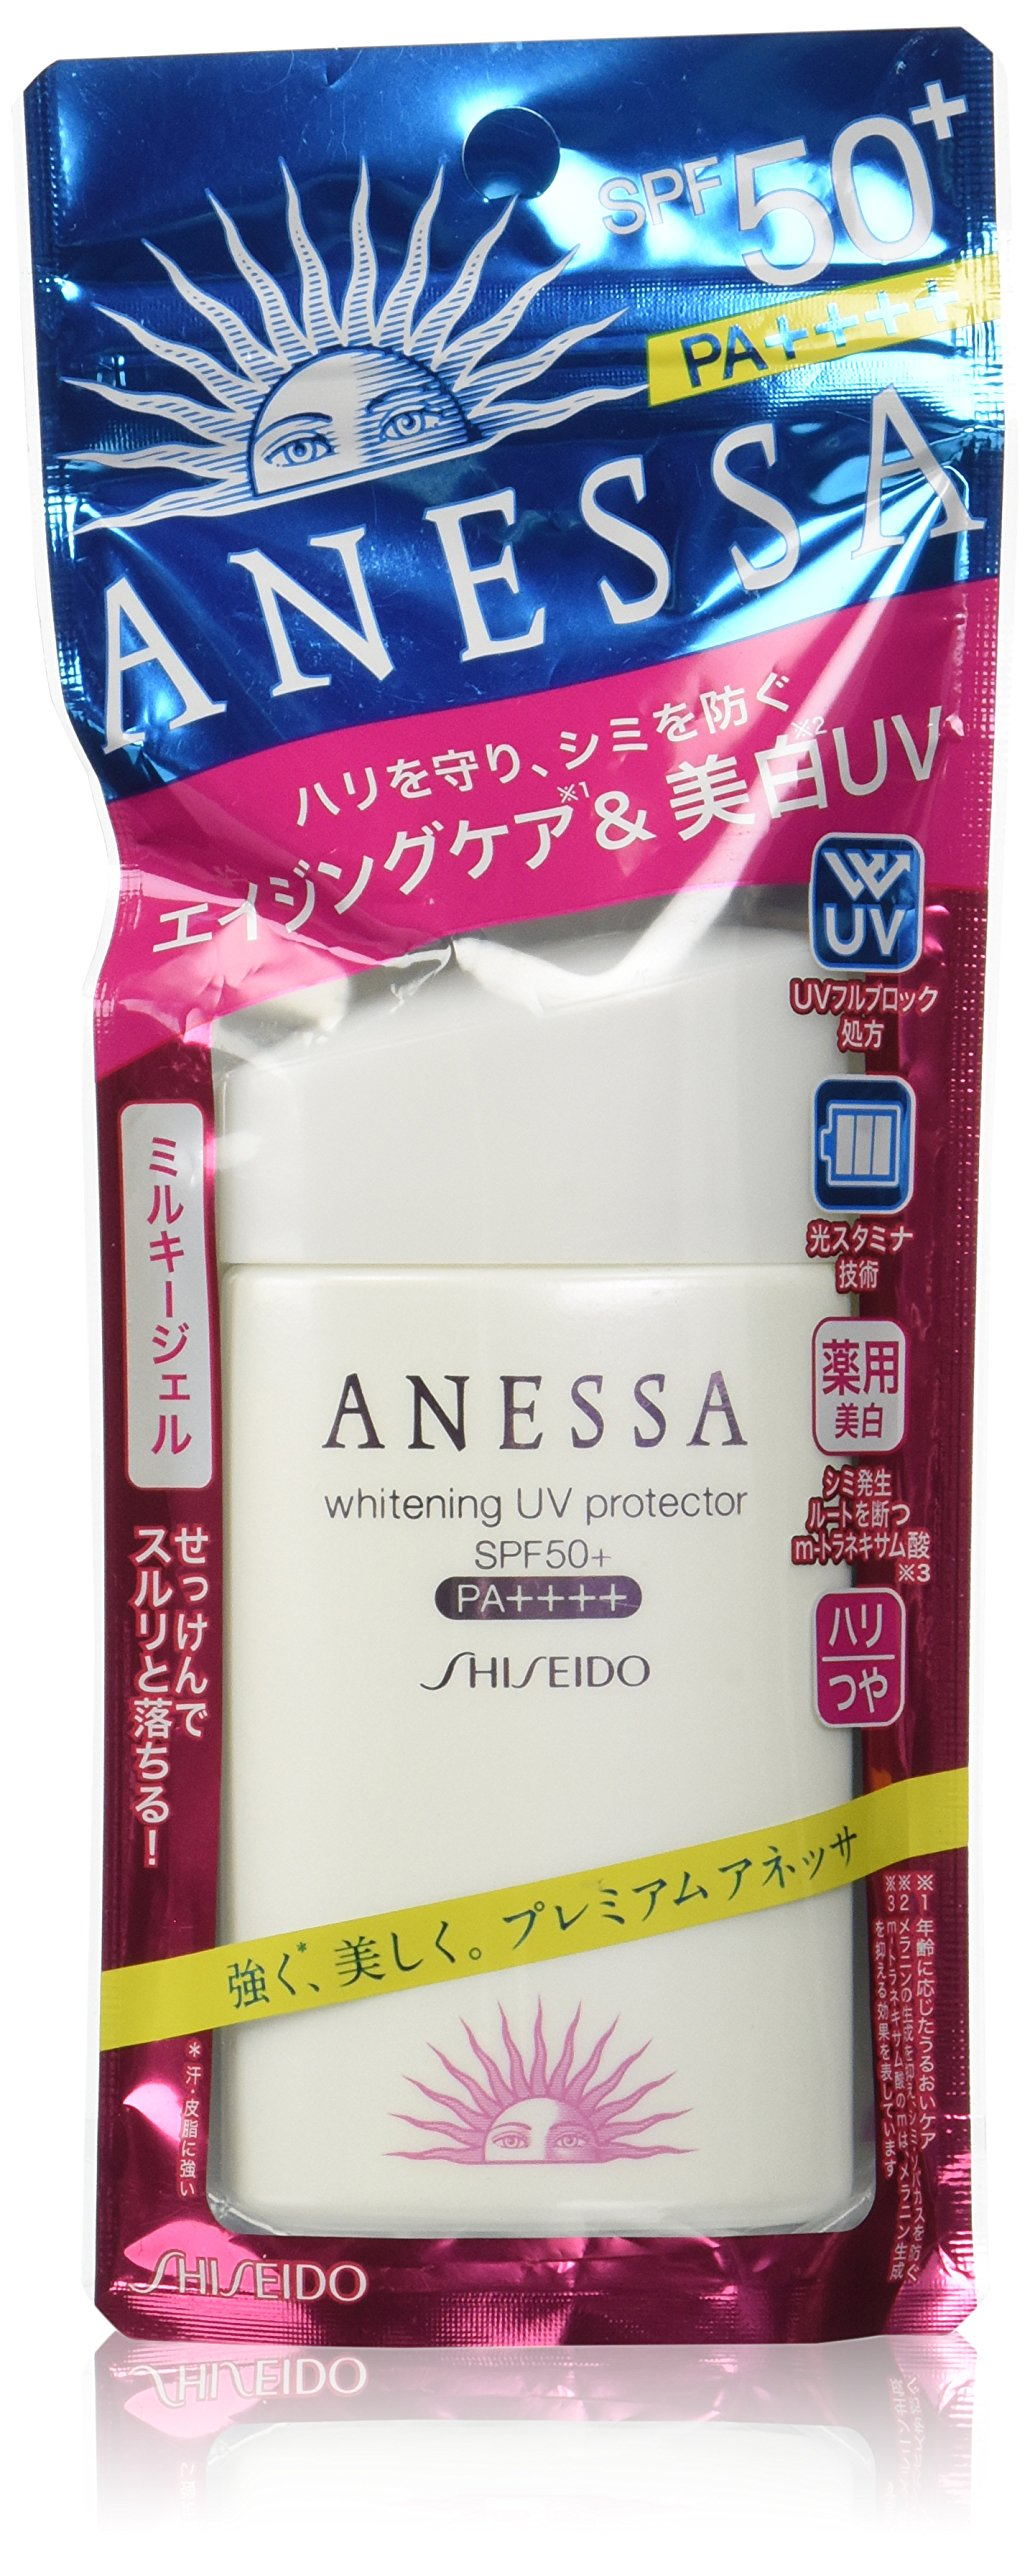 Shiseido Anessa Whitening Sunscreen